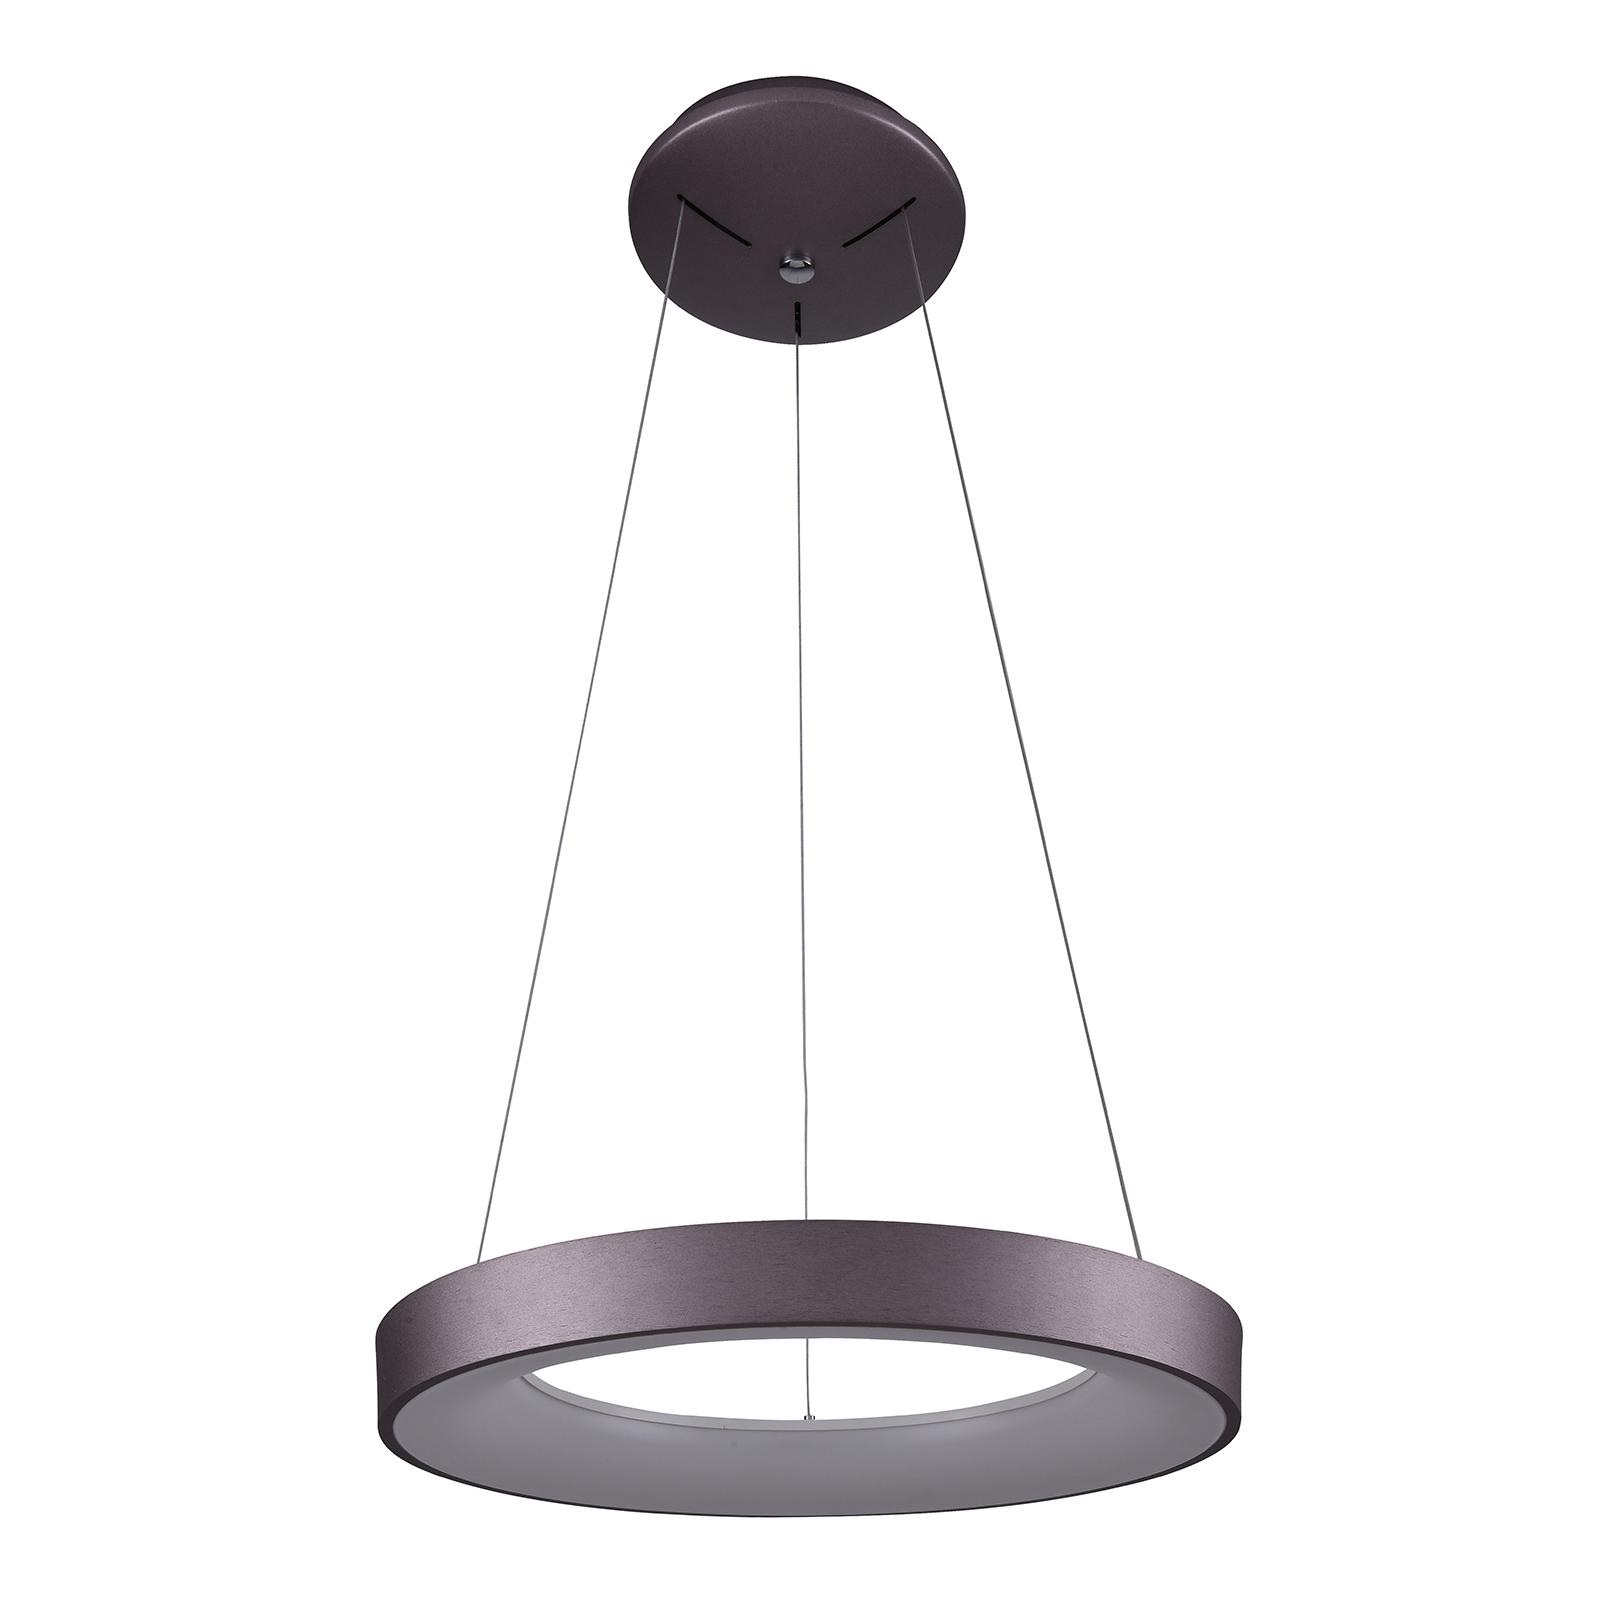 Giulia 5304 850RP CO 3 nowoczesna lampa wisząca LED Italux